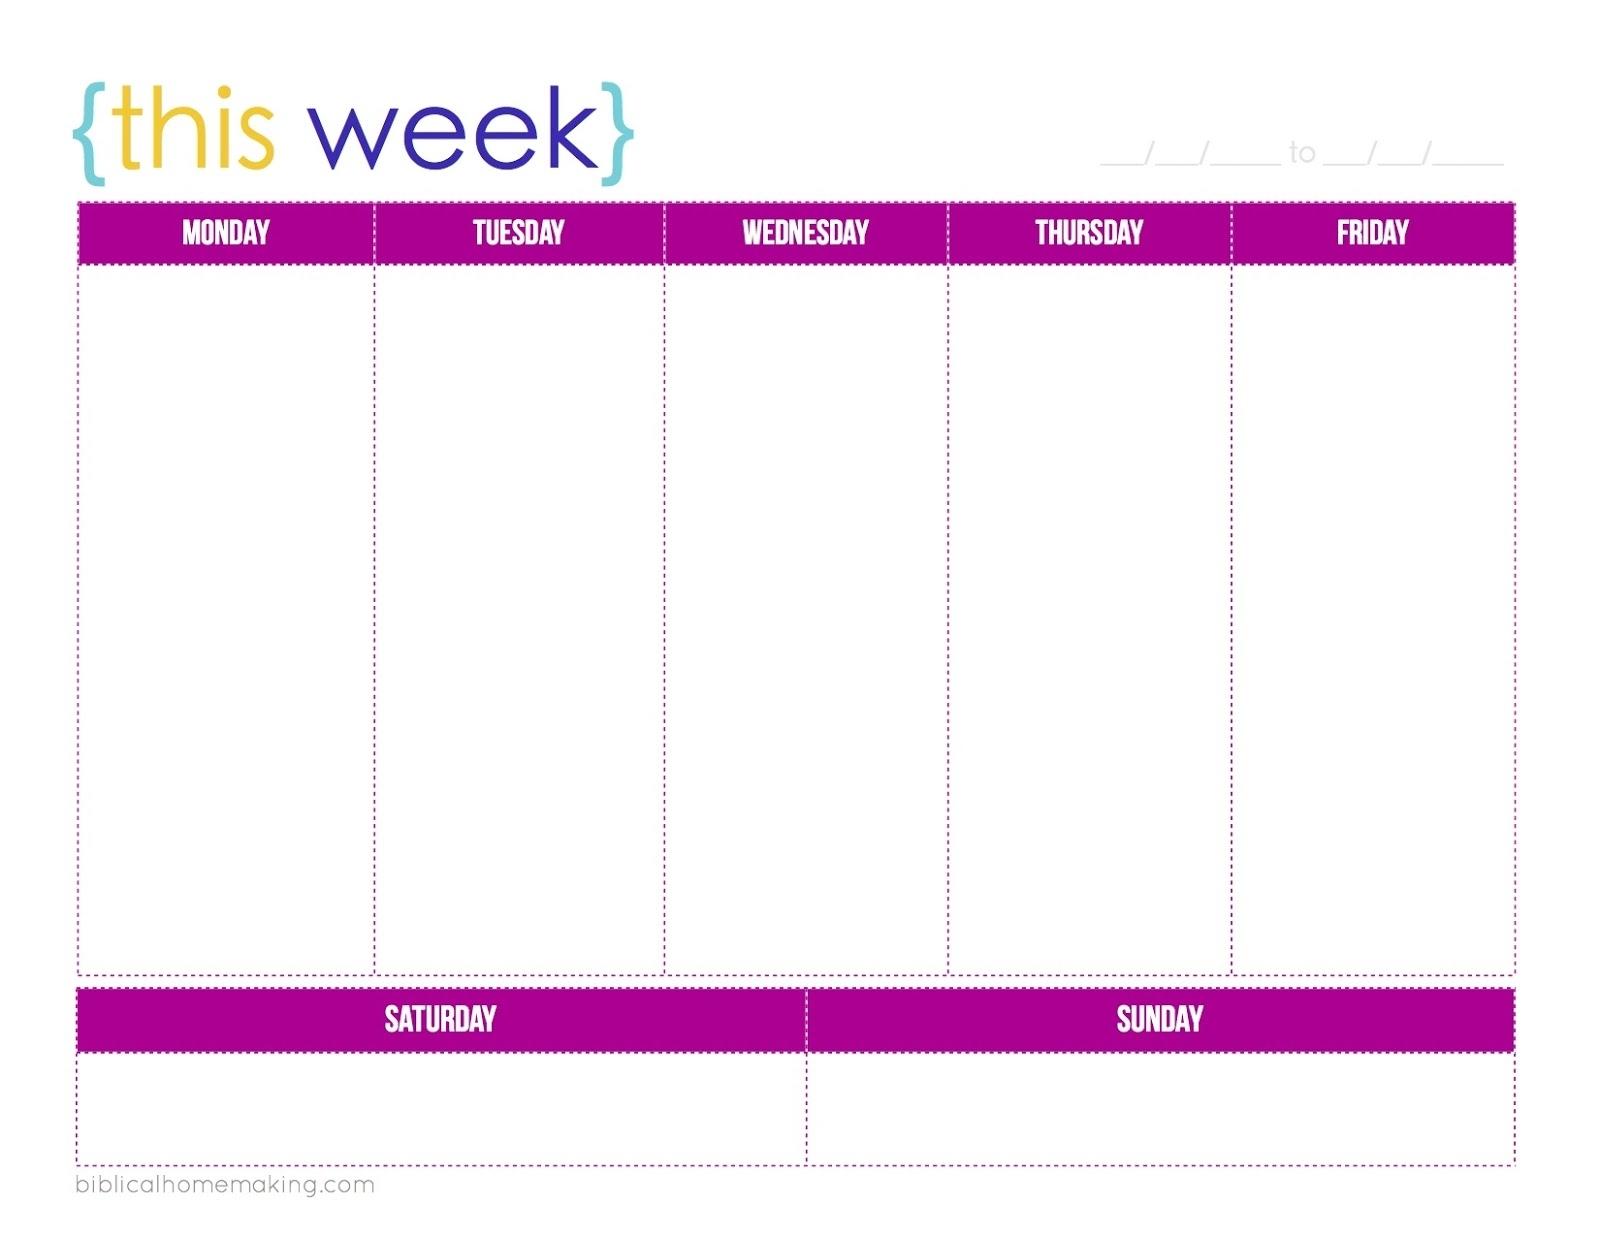 Blank Printable Weekly Schedule Template One Week | Smorad pertaining to Free One Week Schedule Template